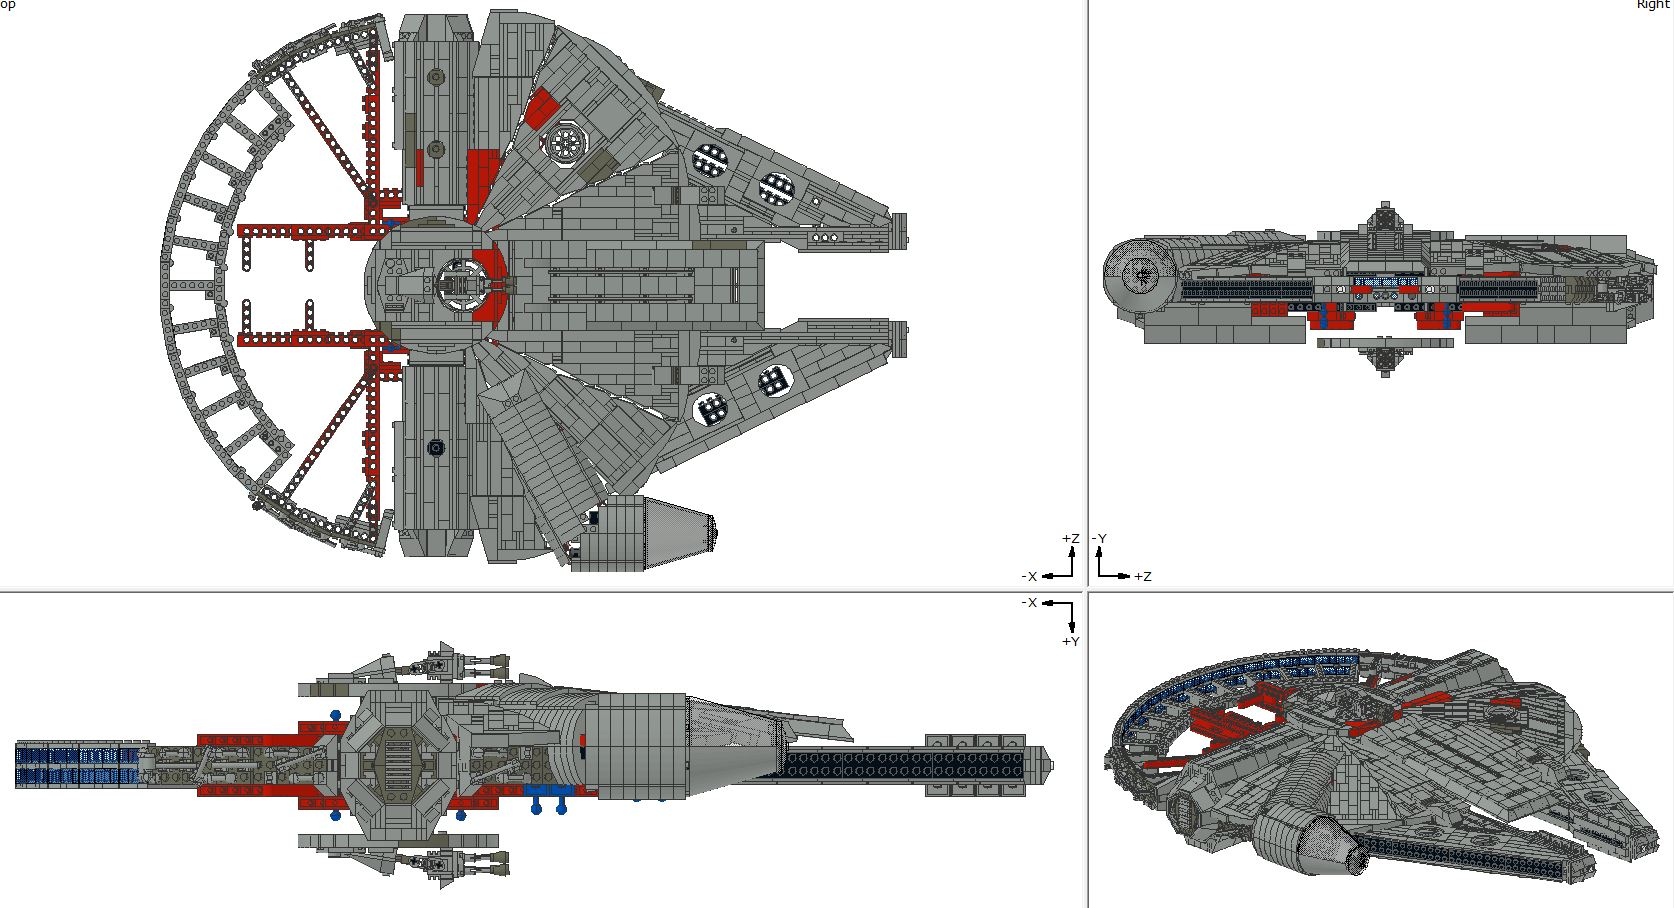 falcon-3-28-17.jpg